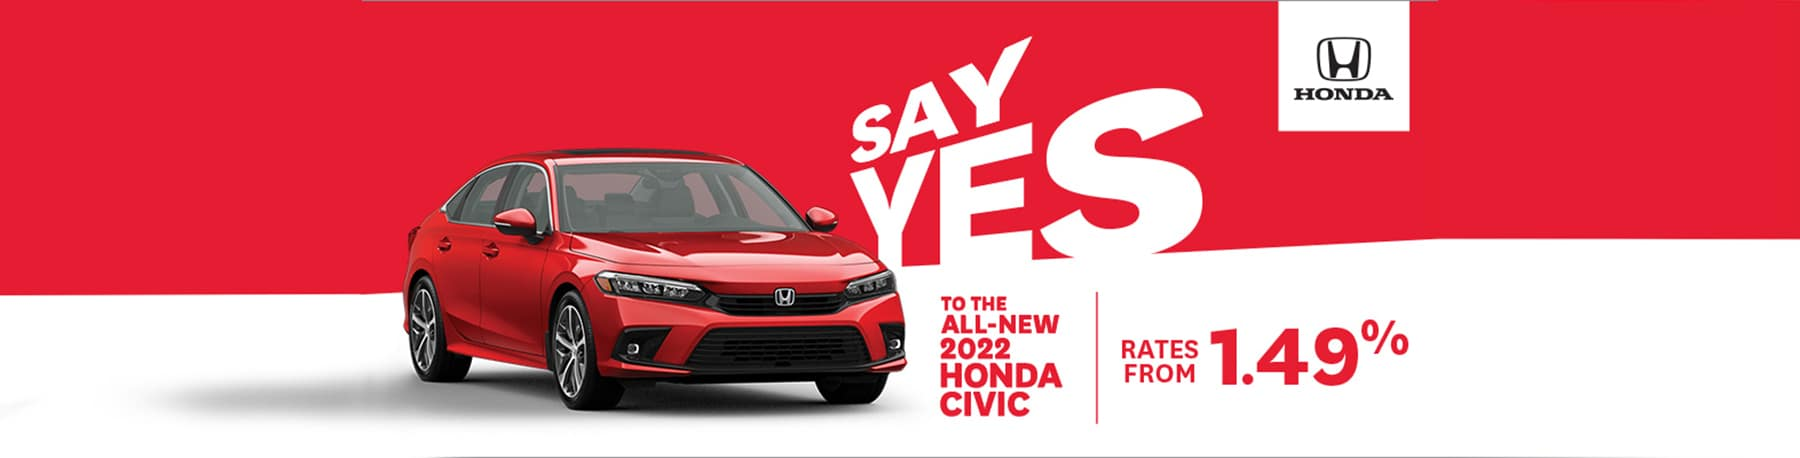 Say Yes Civic